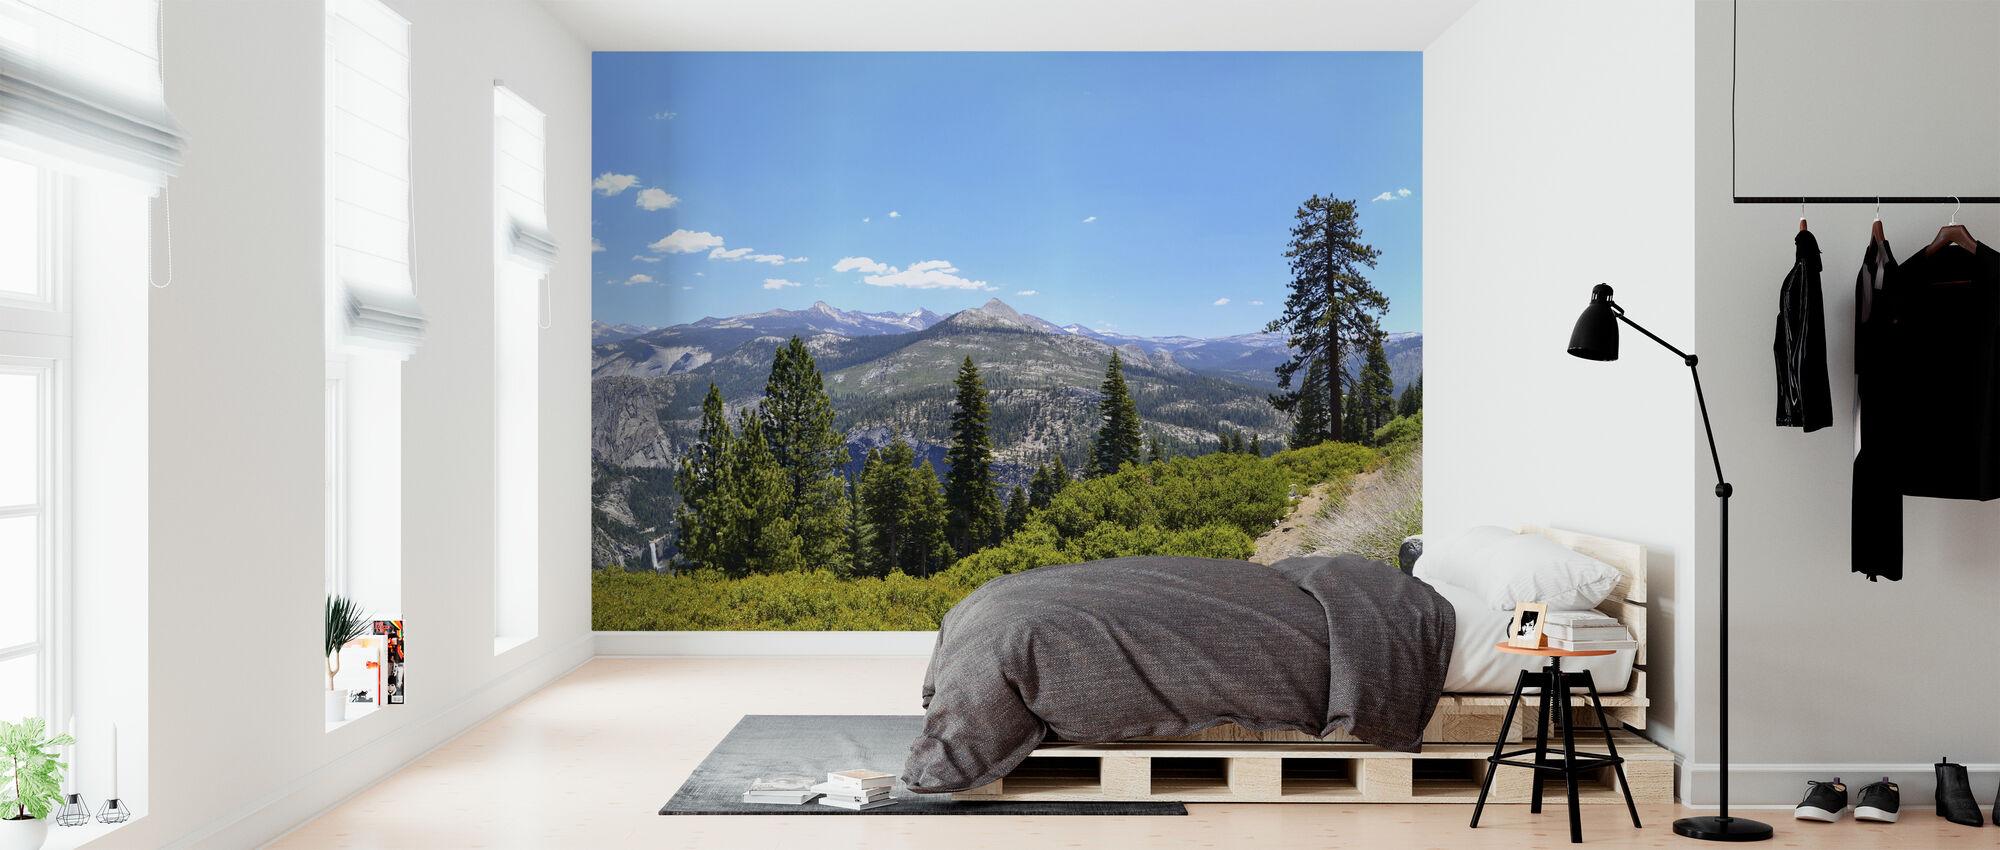 Nationaal park Yosemite - Behang - Slaapkamer